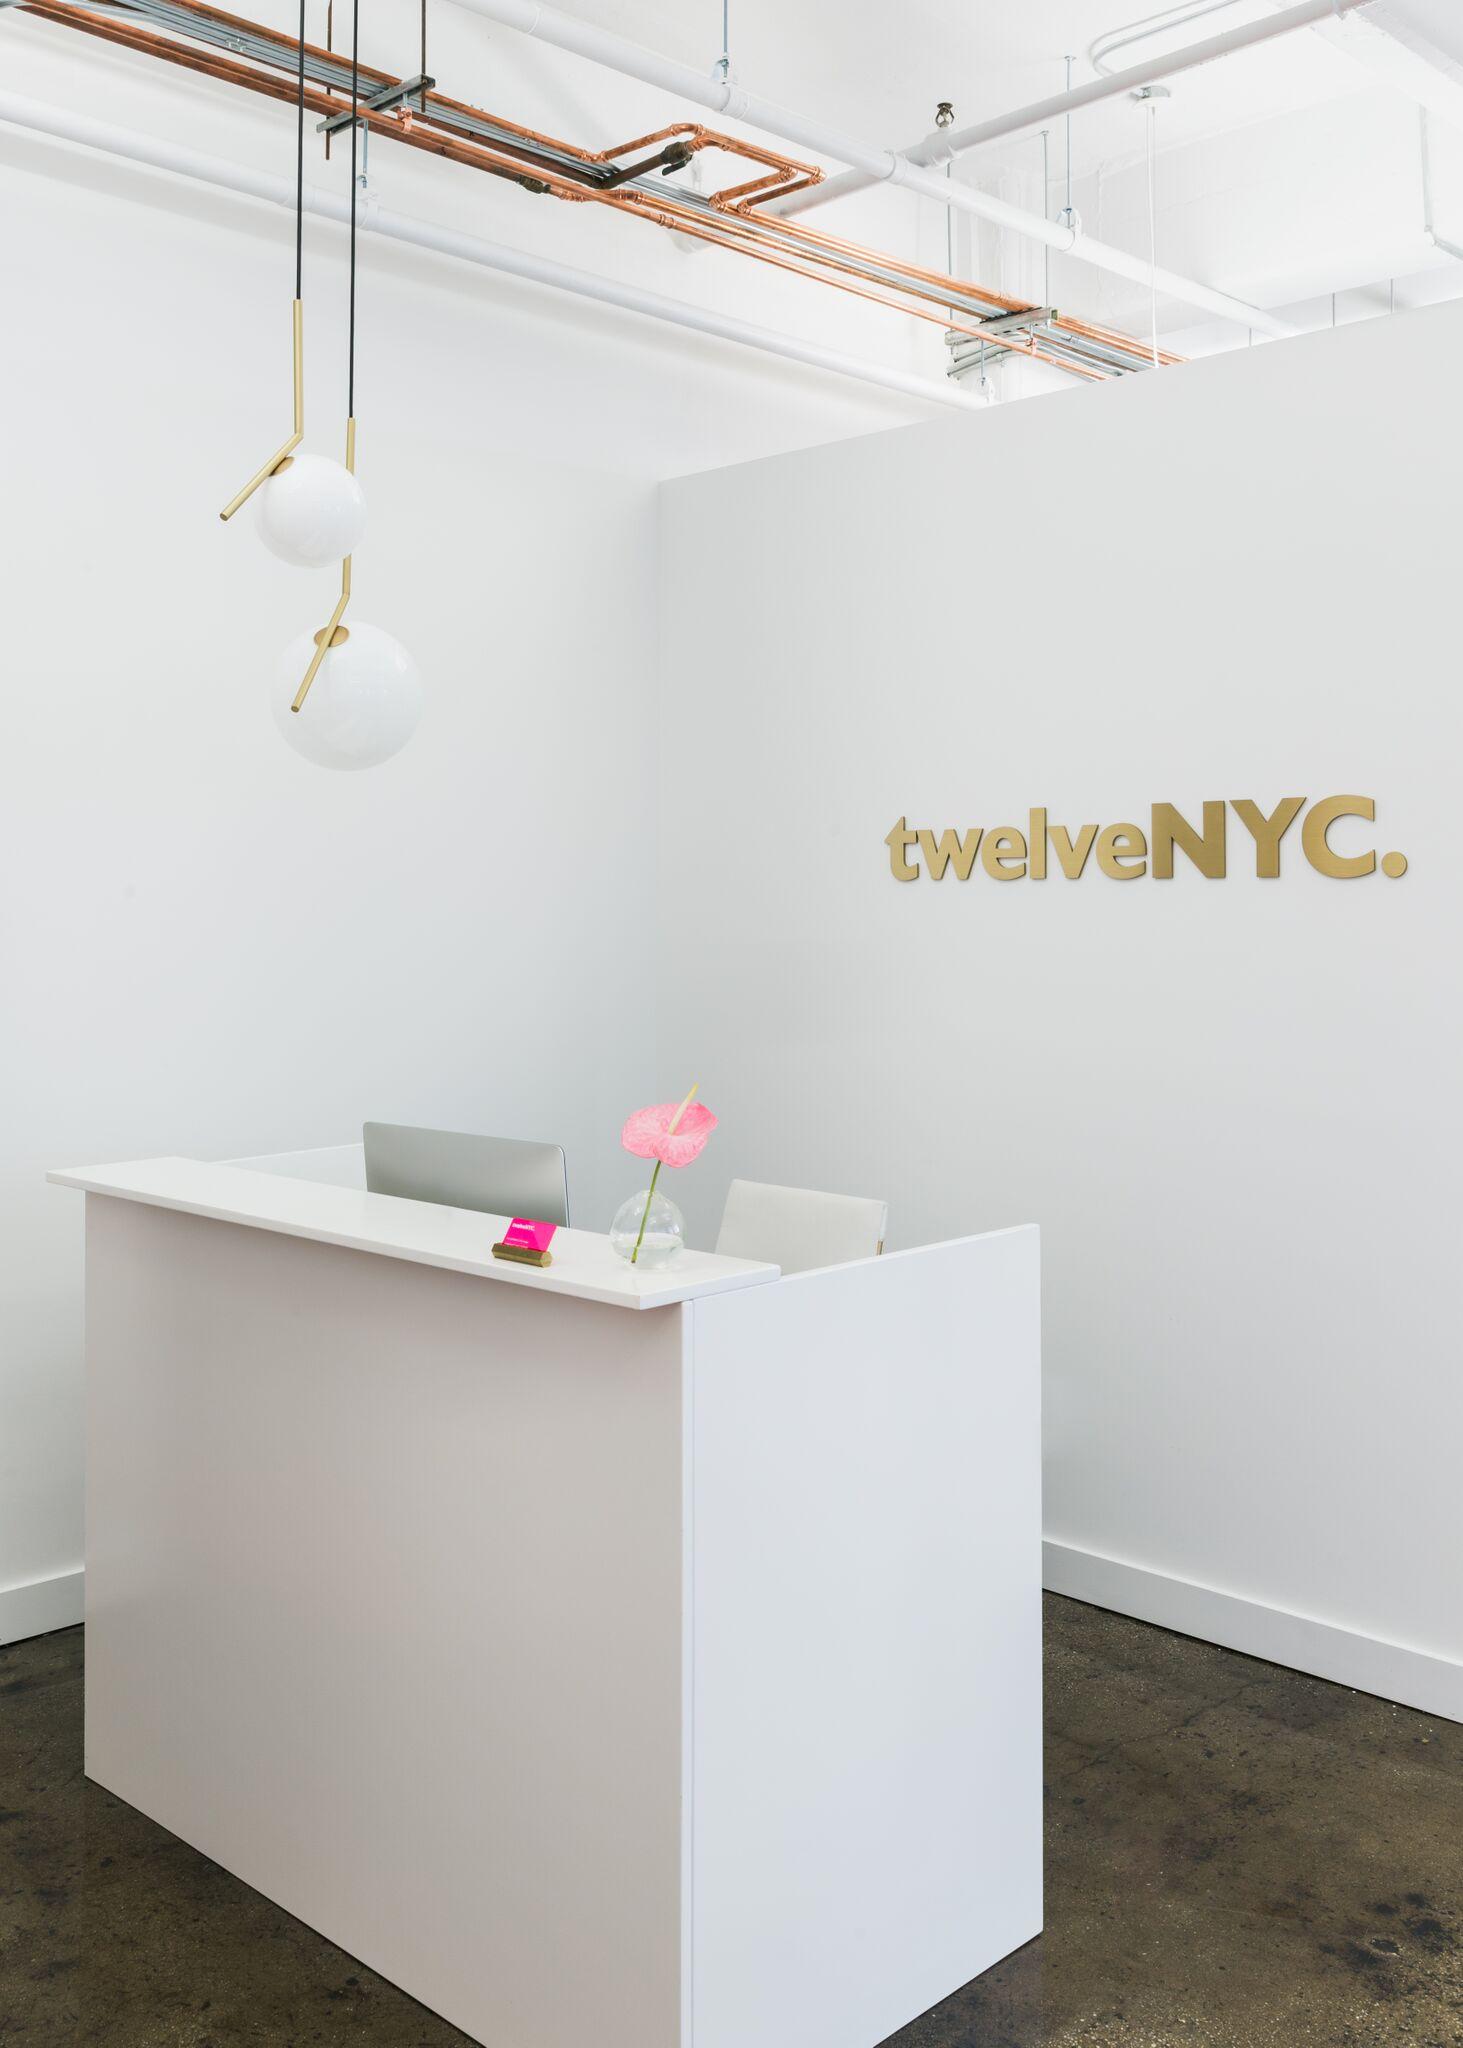 Caplan_twelveNYC_02.jpg